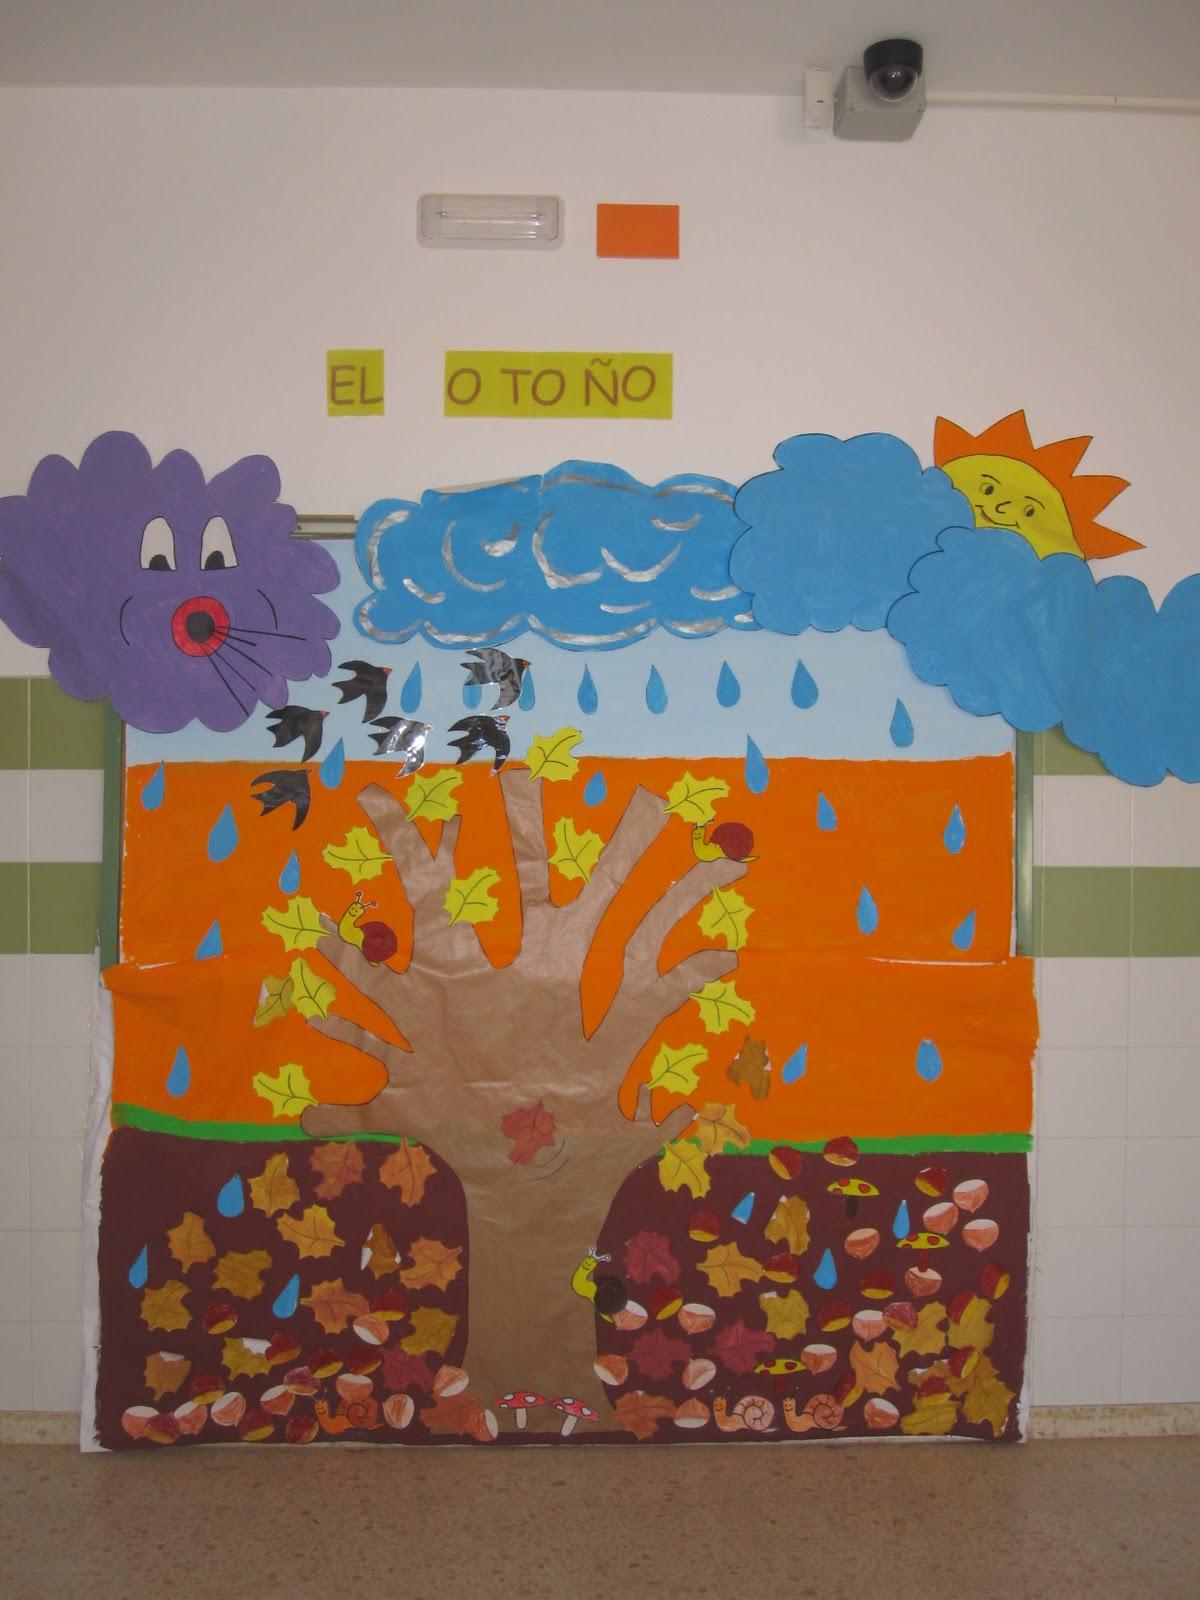 Mi mundo de colores educaci n infantil mural del oto o - Mural pared infantil ...